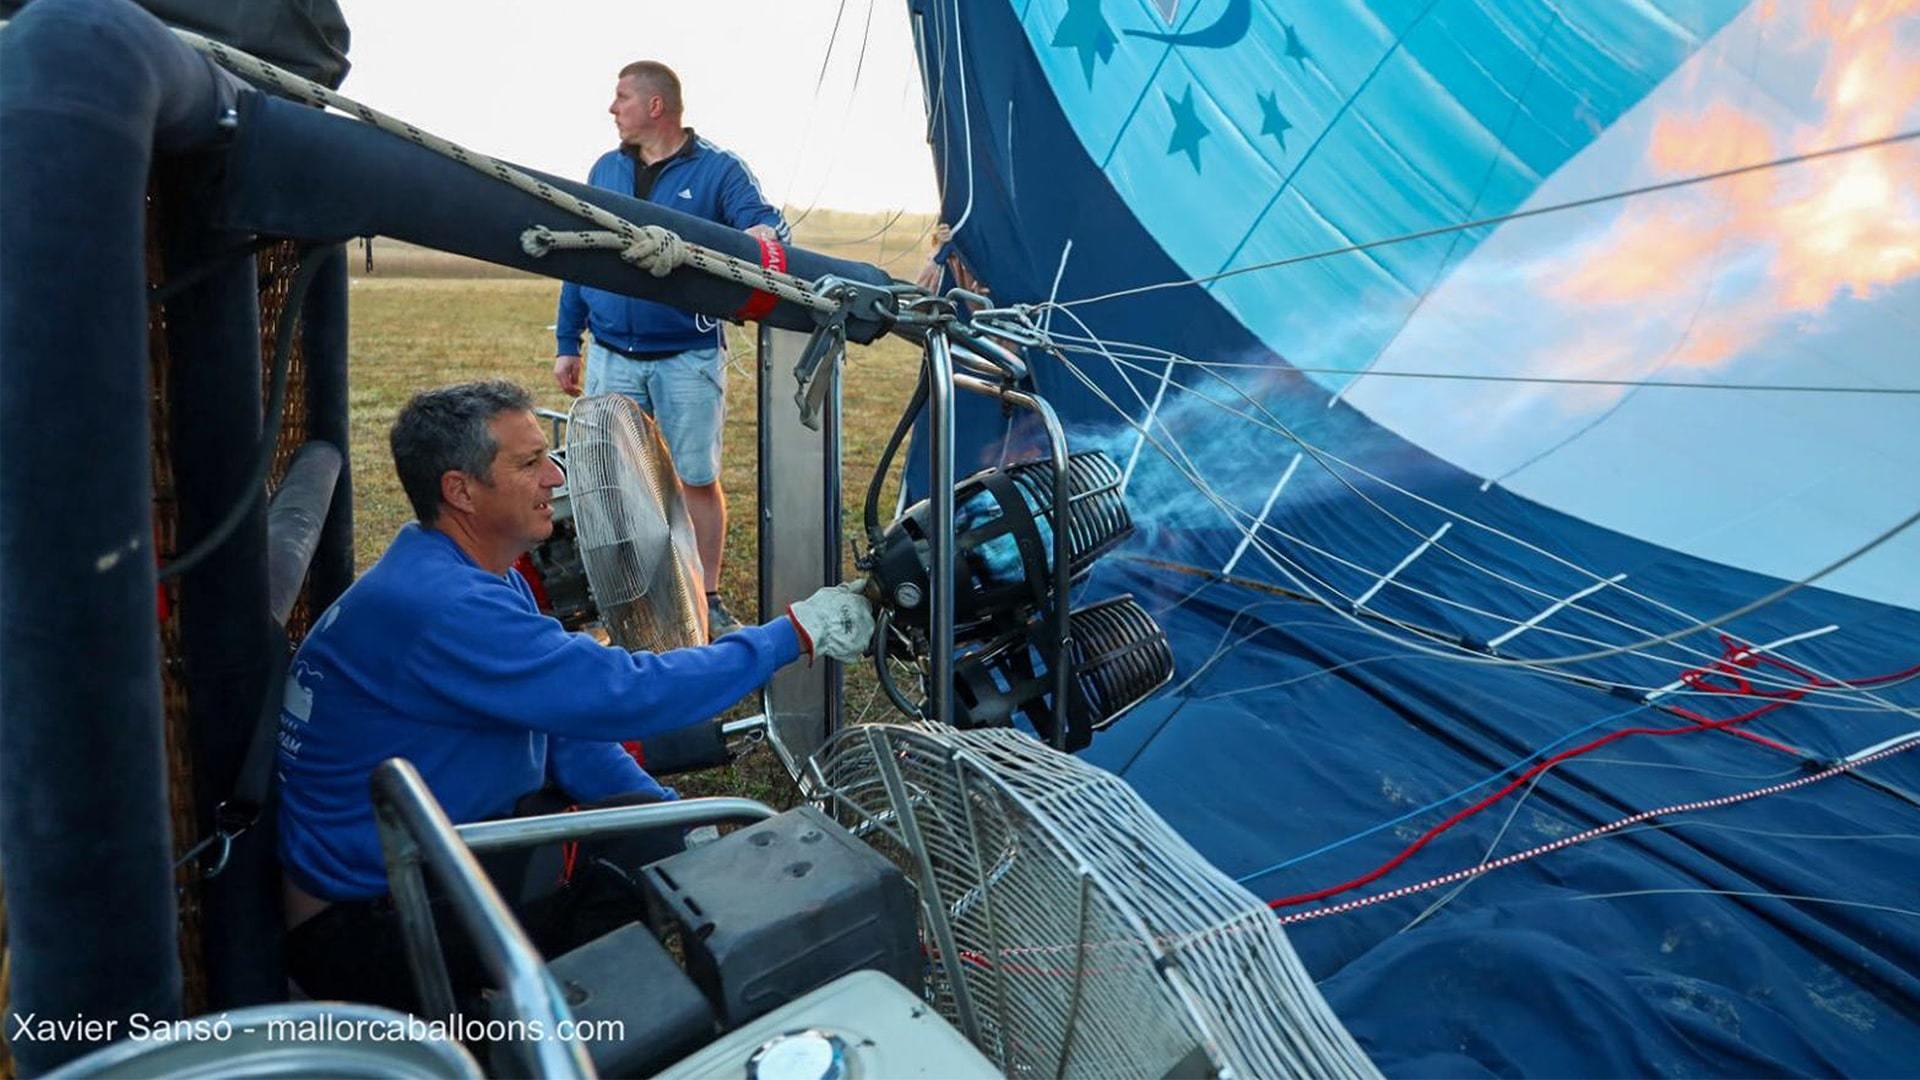 Hot air balloon getting ready mallorca championships min